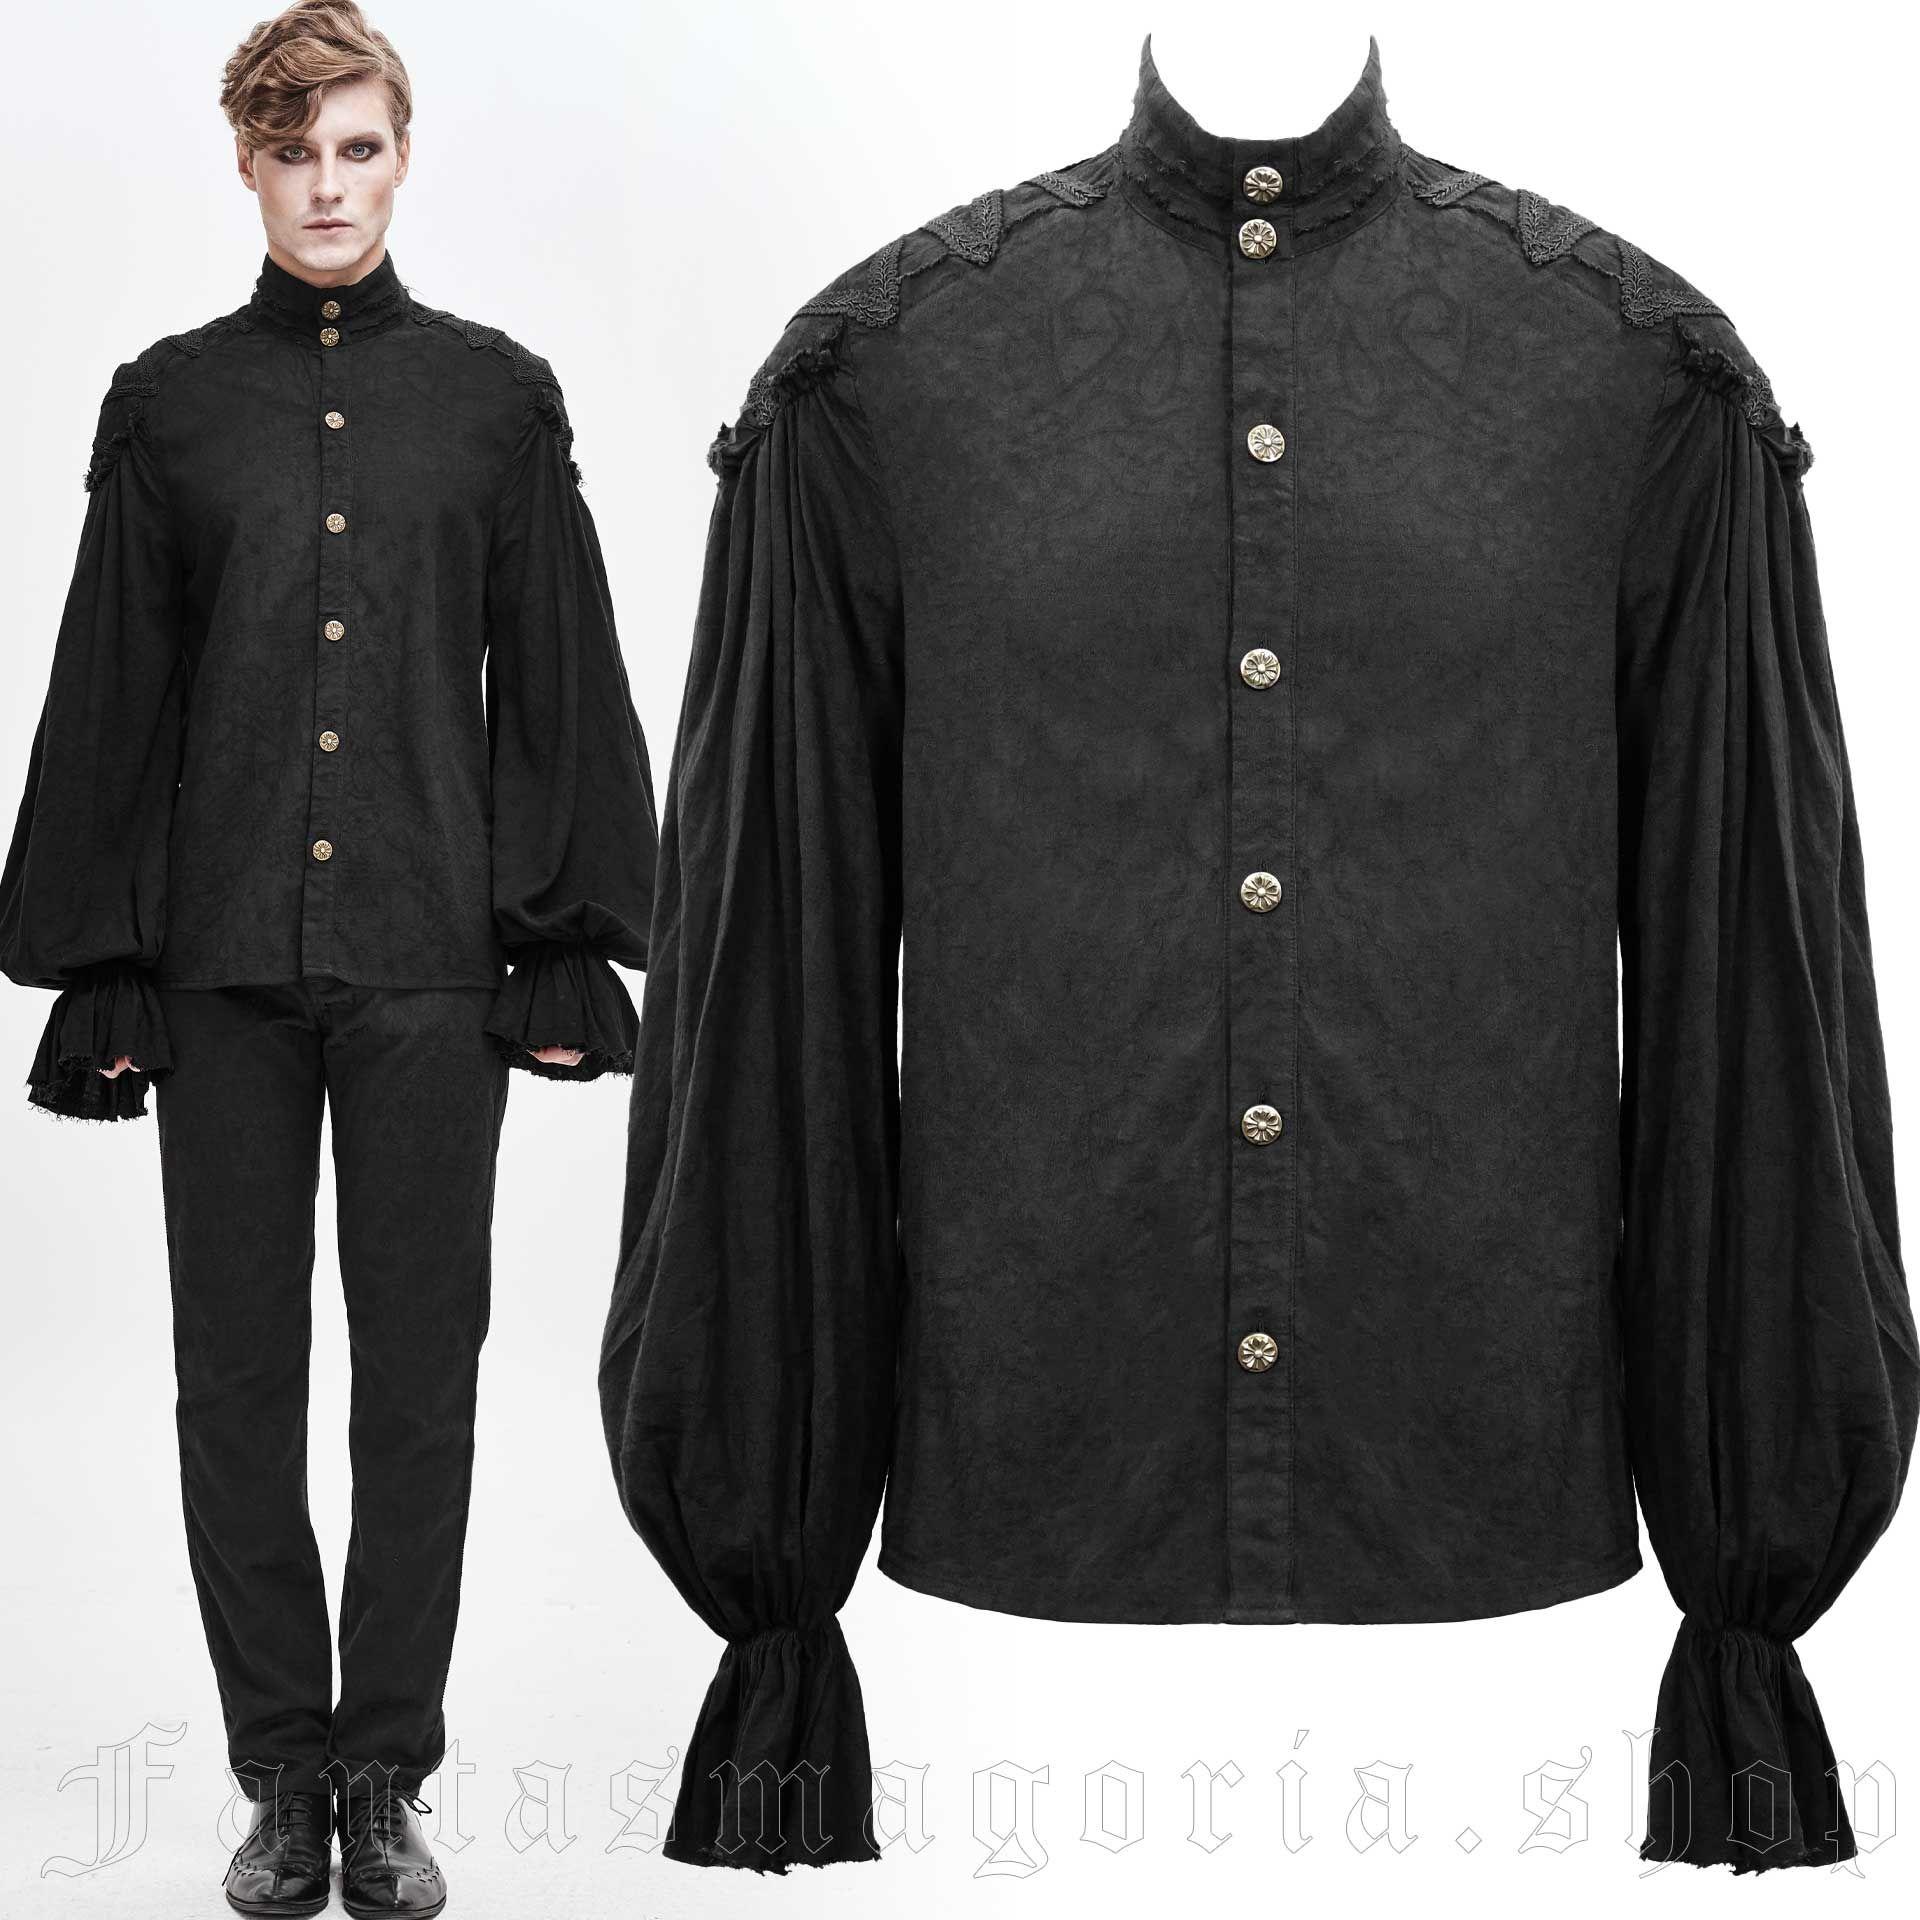 Pierrot Black Shirt